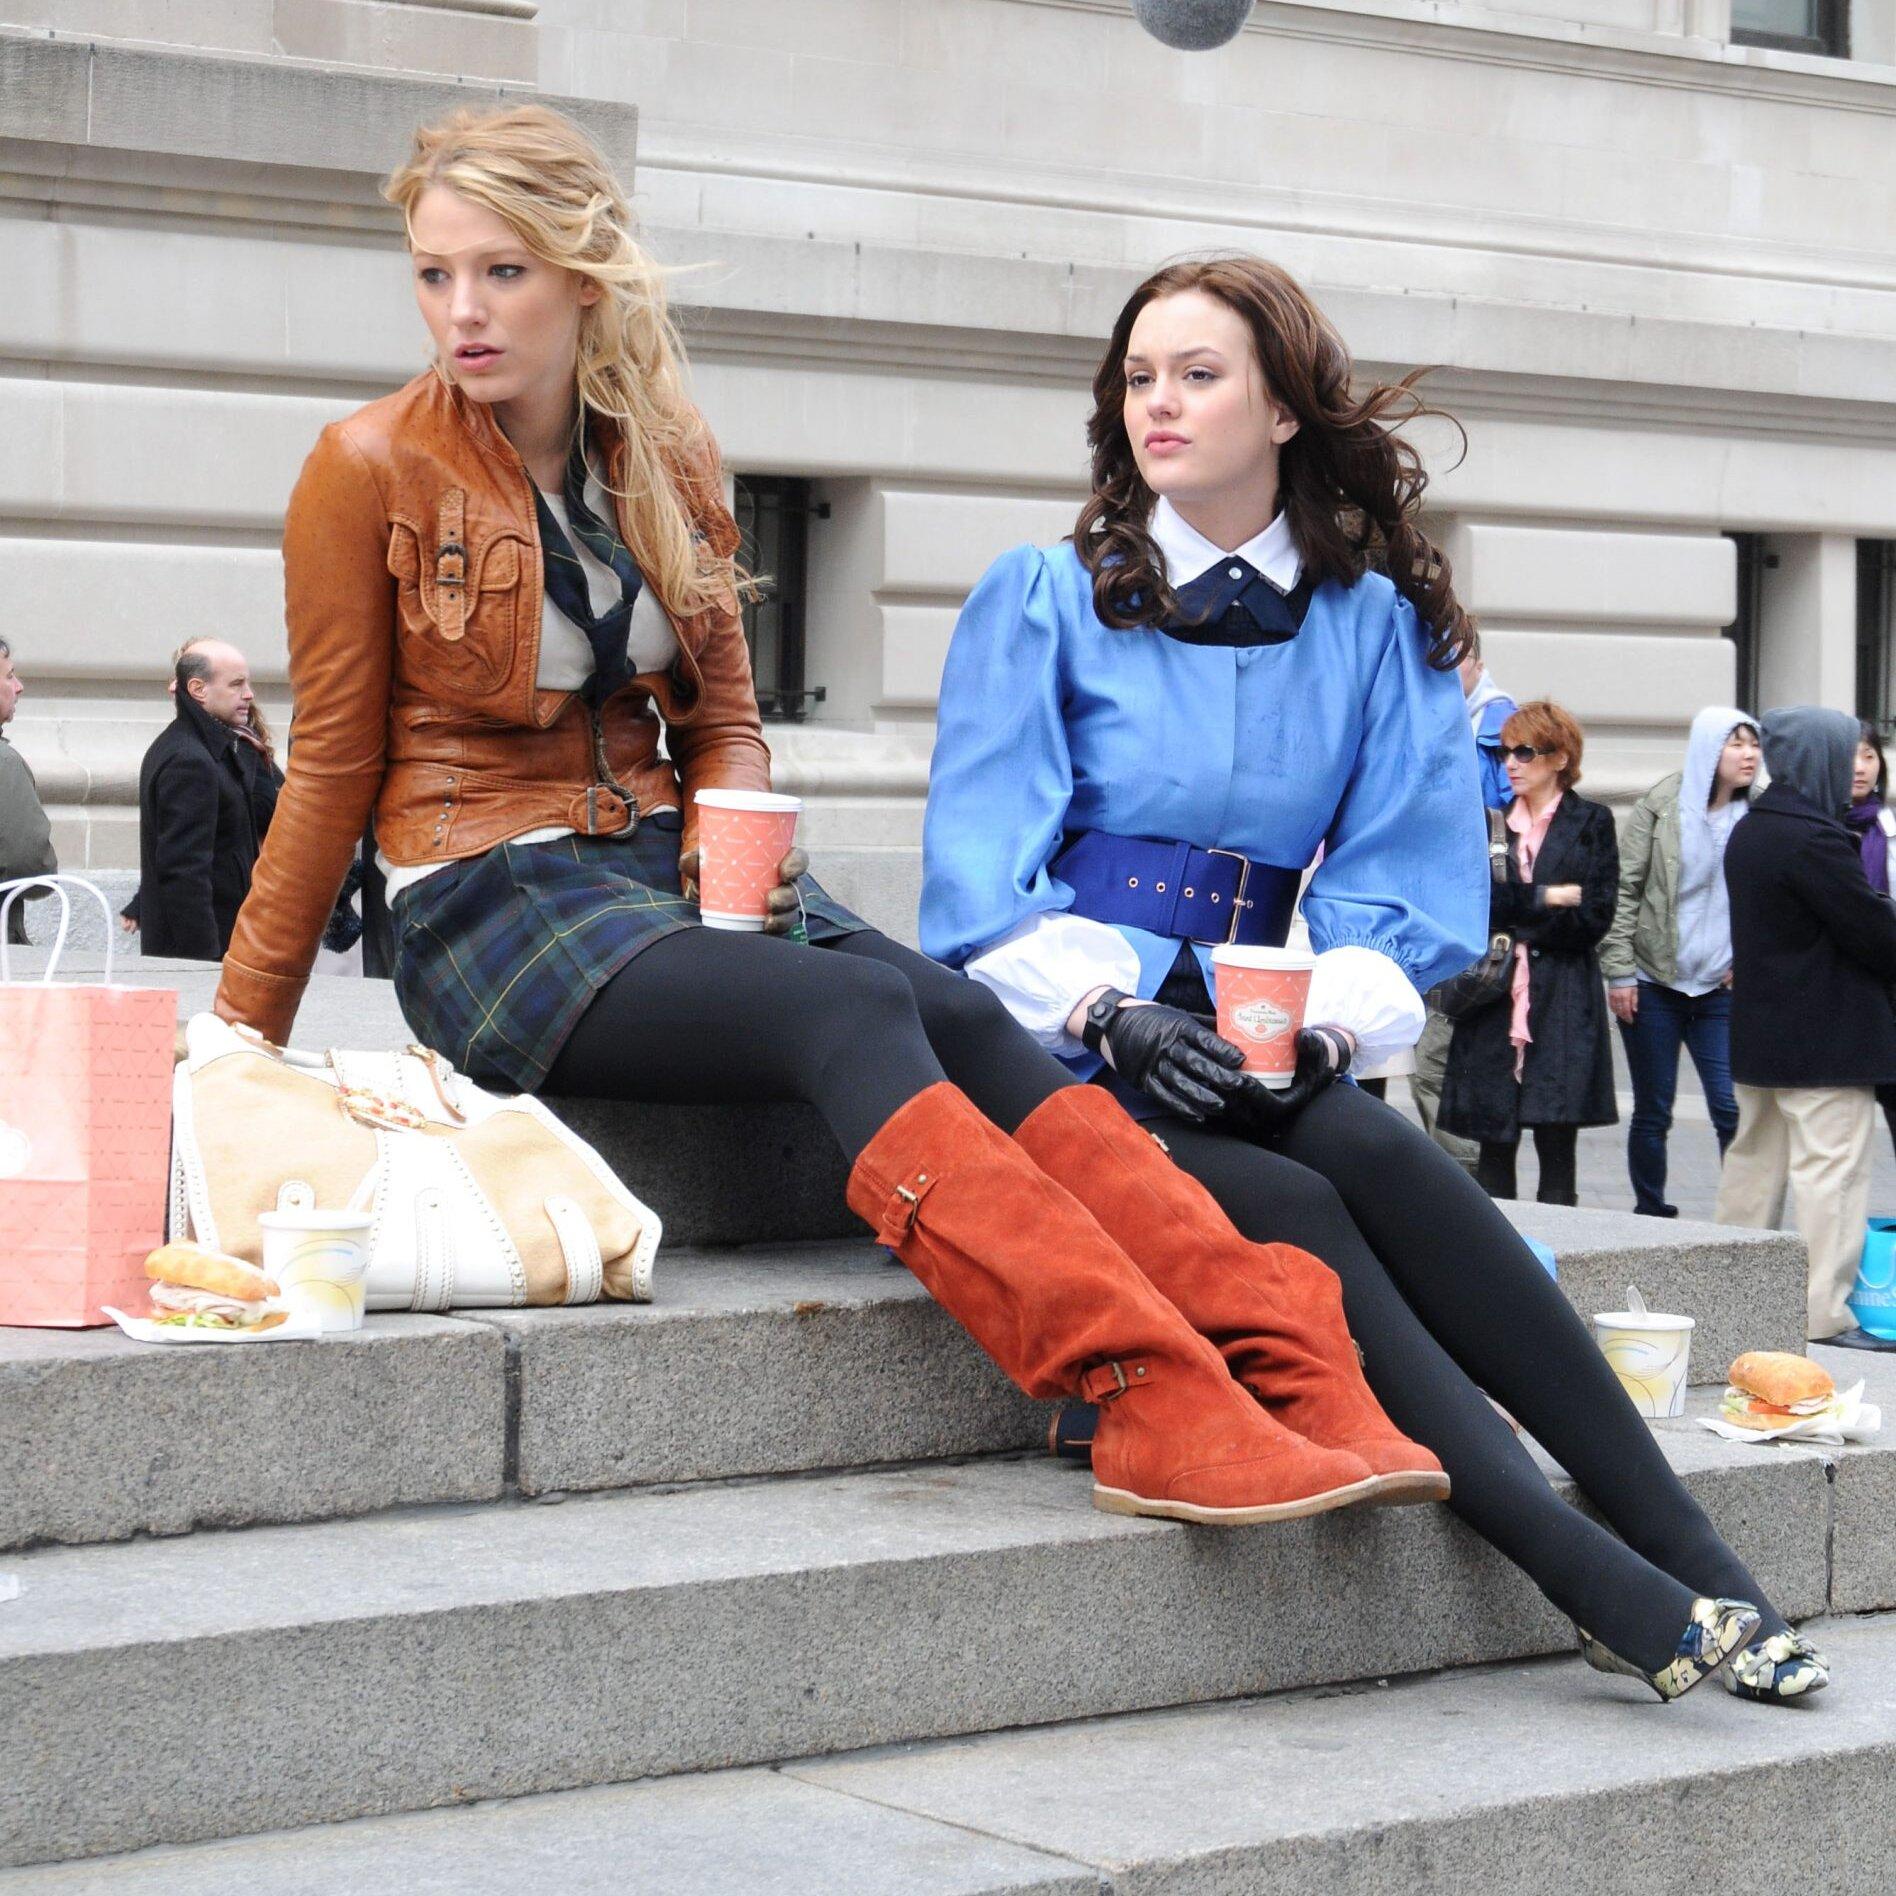 Blake Lively et Leighton Meester dans la série originale Gossip Girl. © Arnaldo Magnani/Getty Images